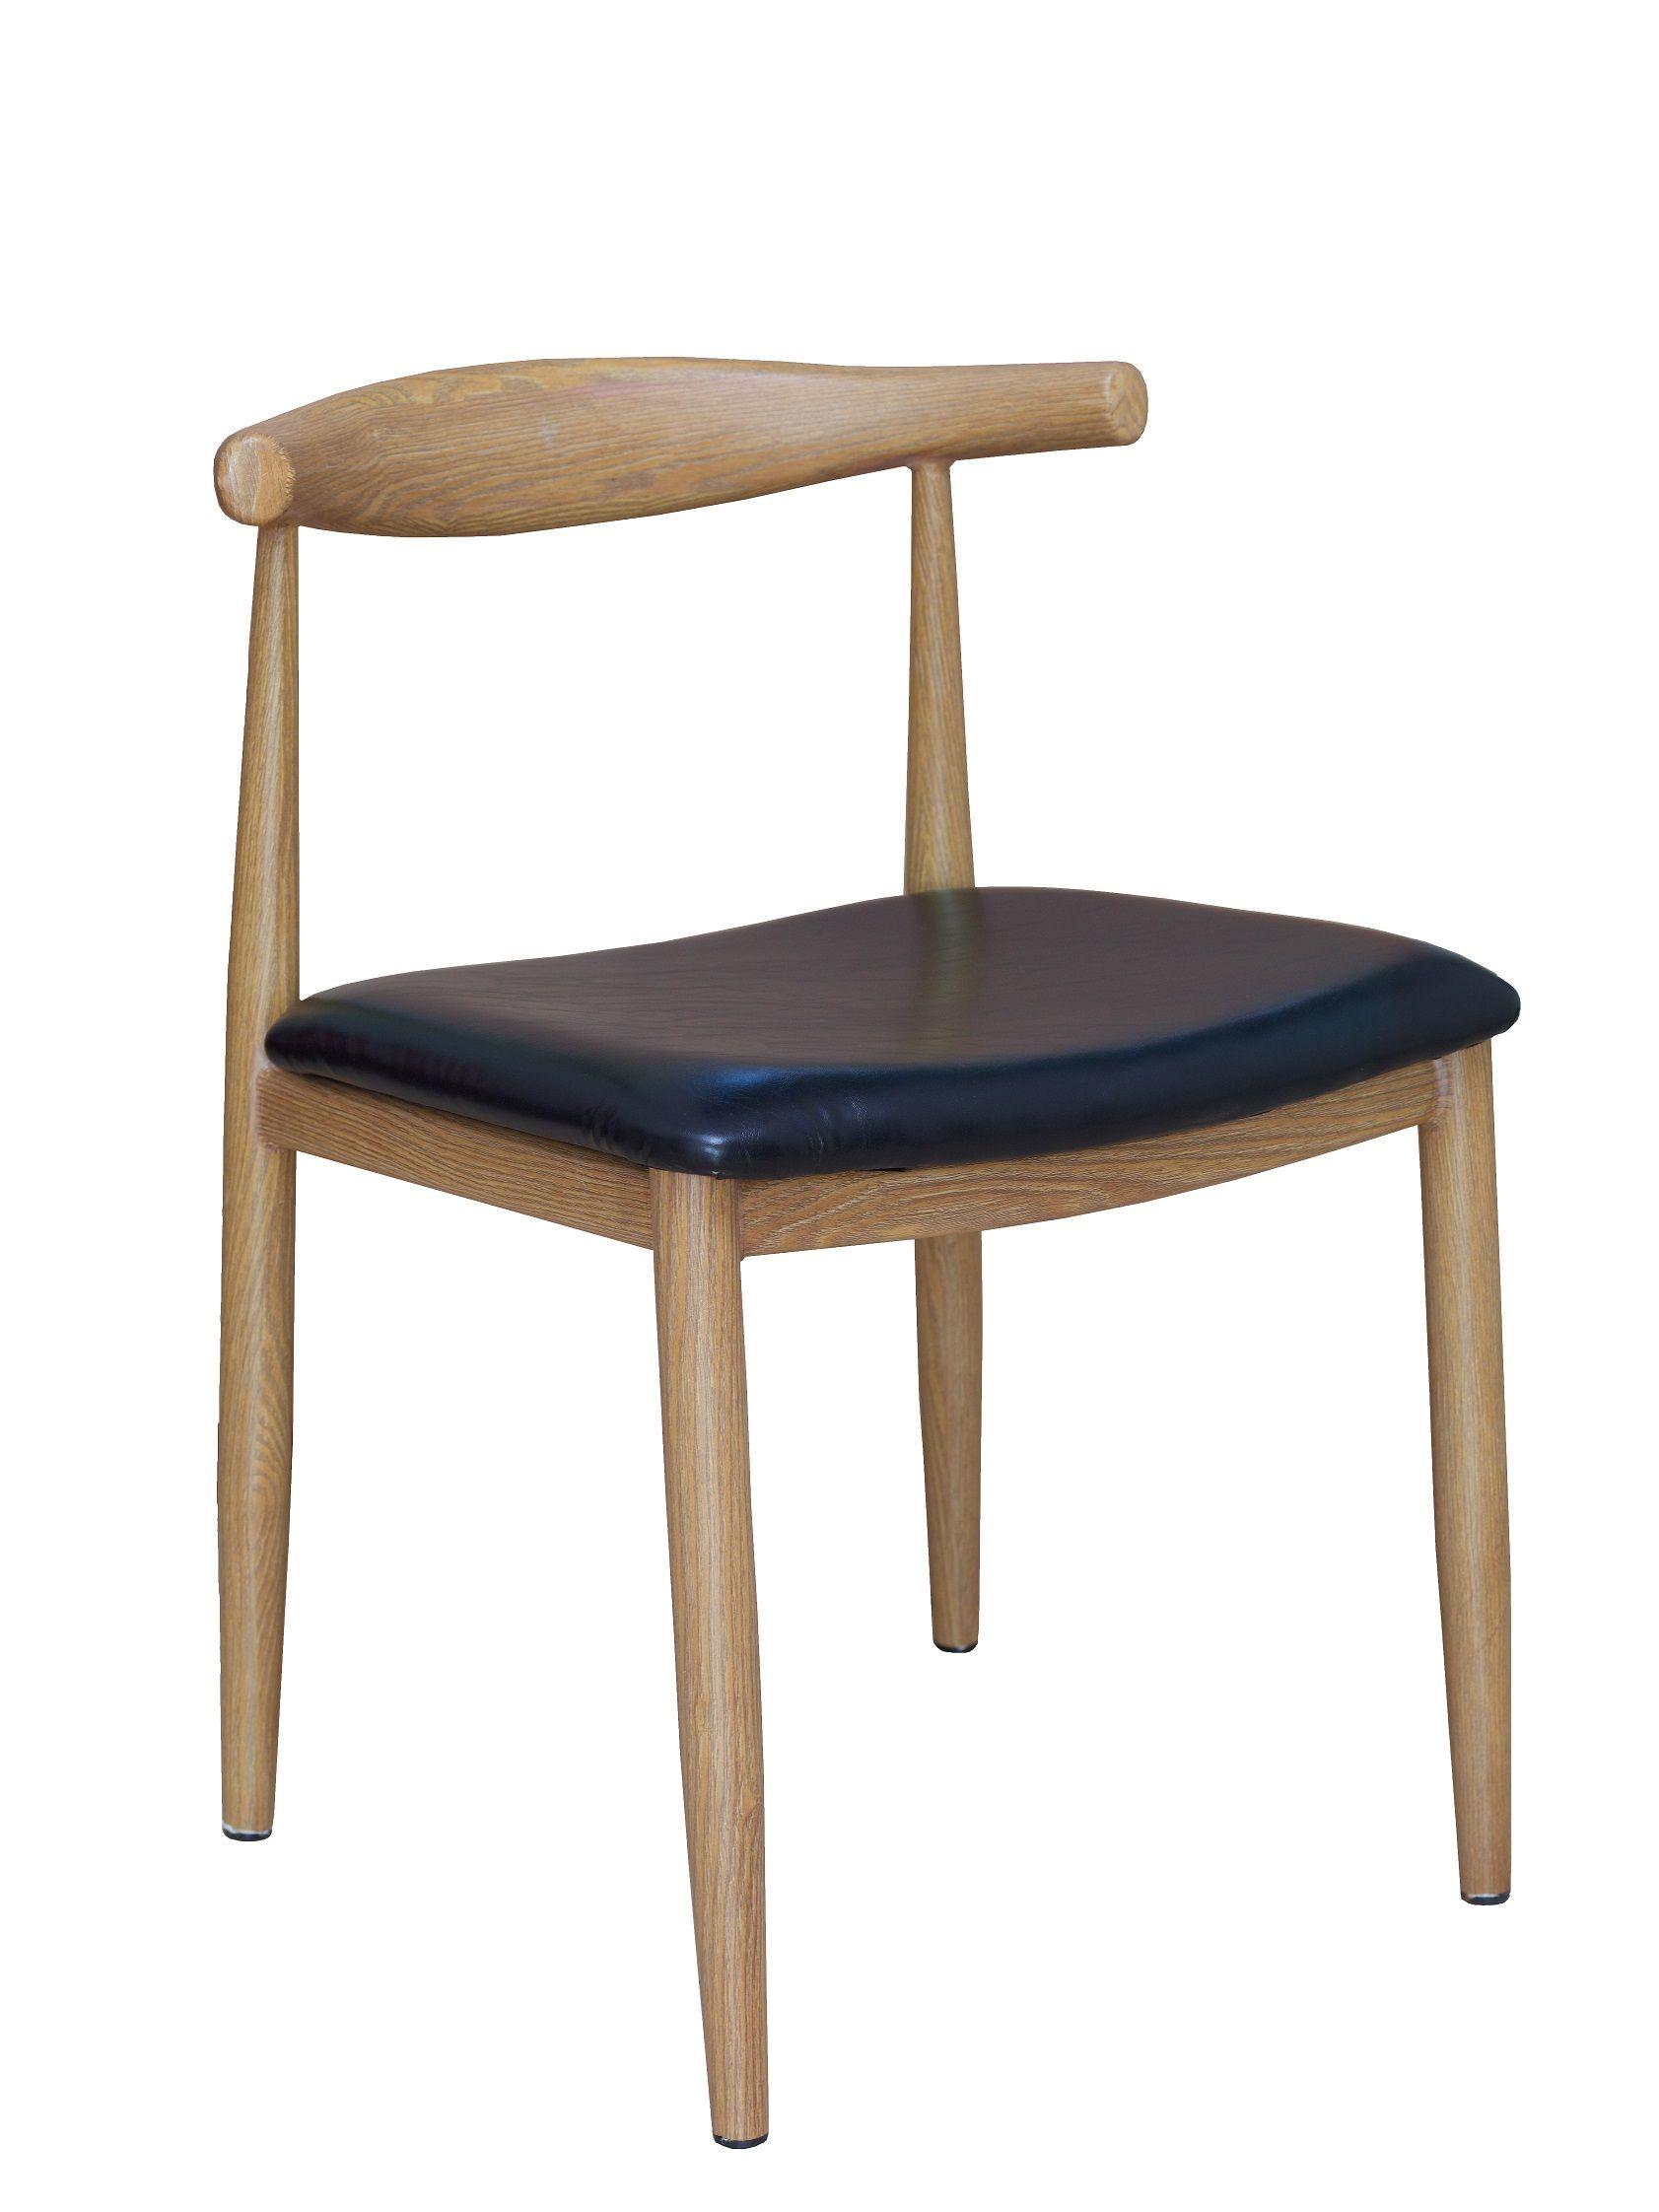 restaurant furniture natural grain walnut finish metal chair w